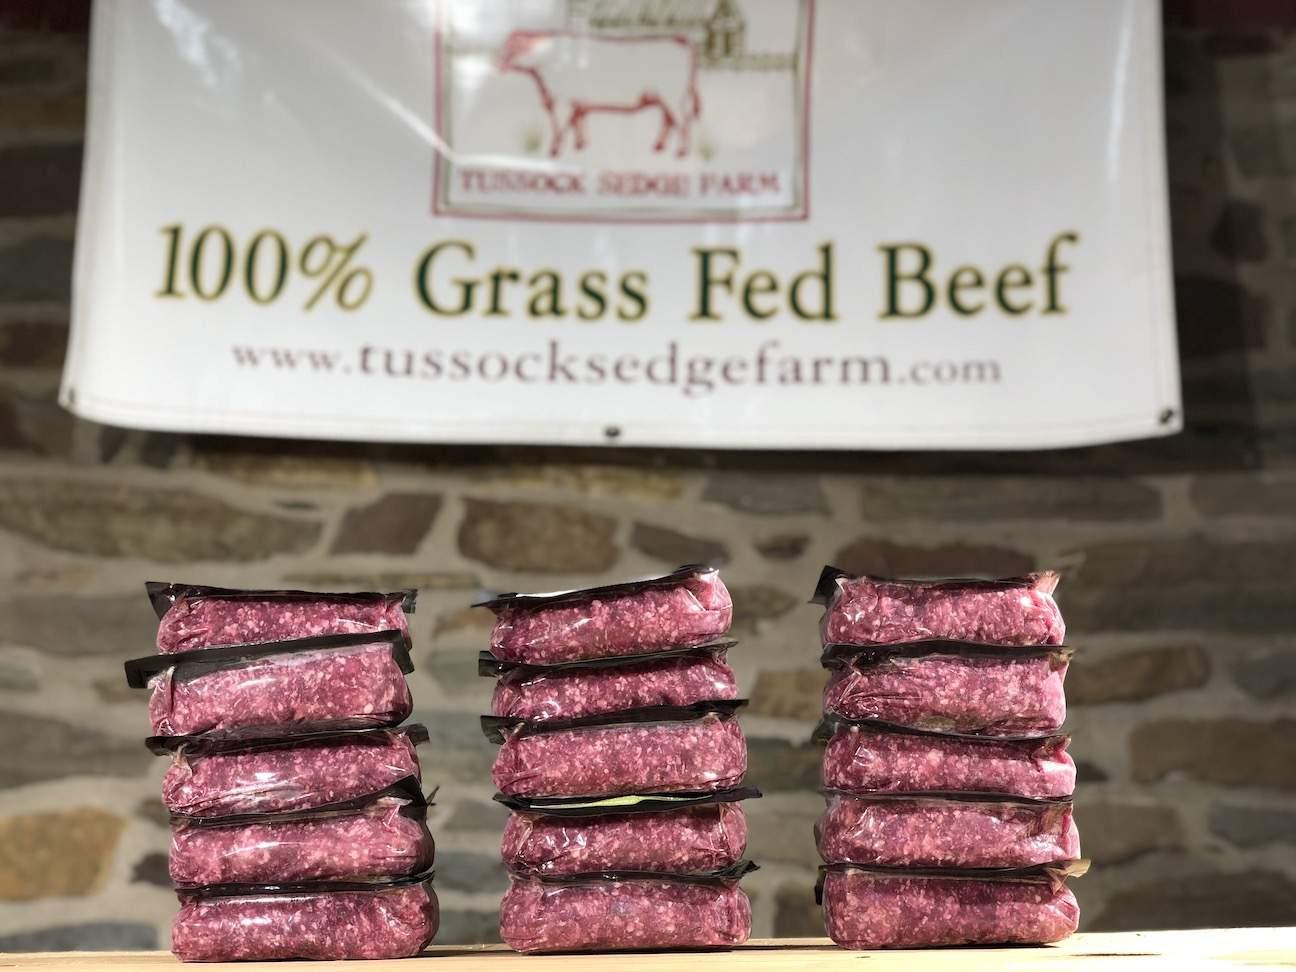 15 lbs Ground Beef - Bulk Purchase